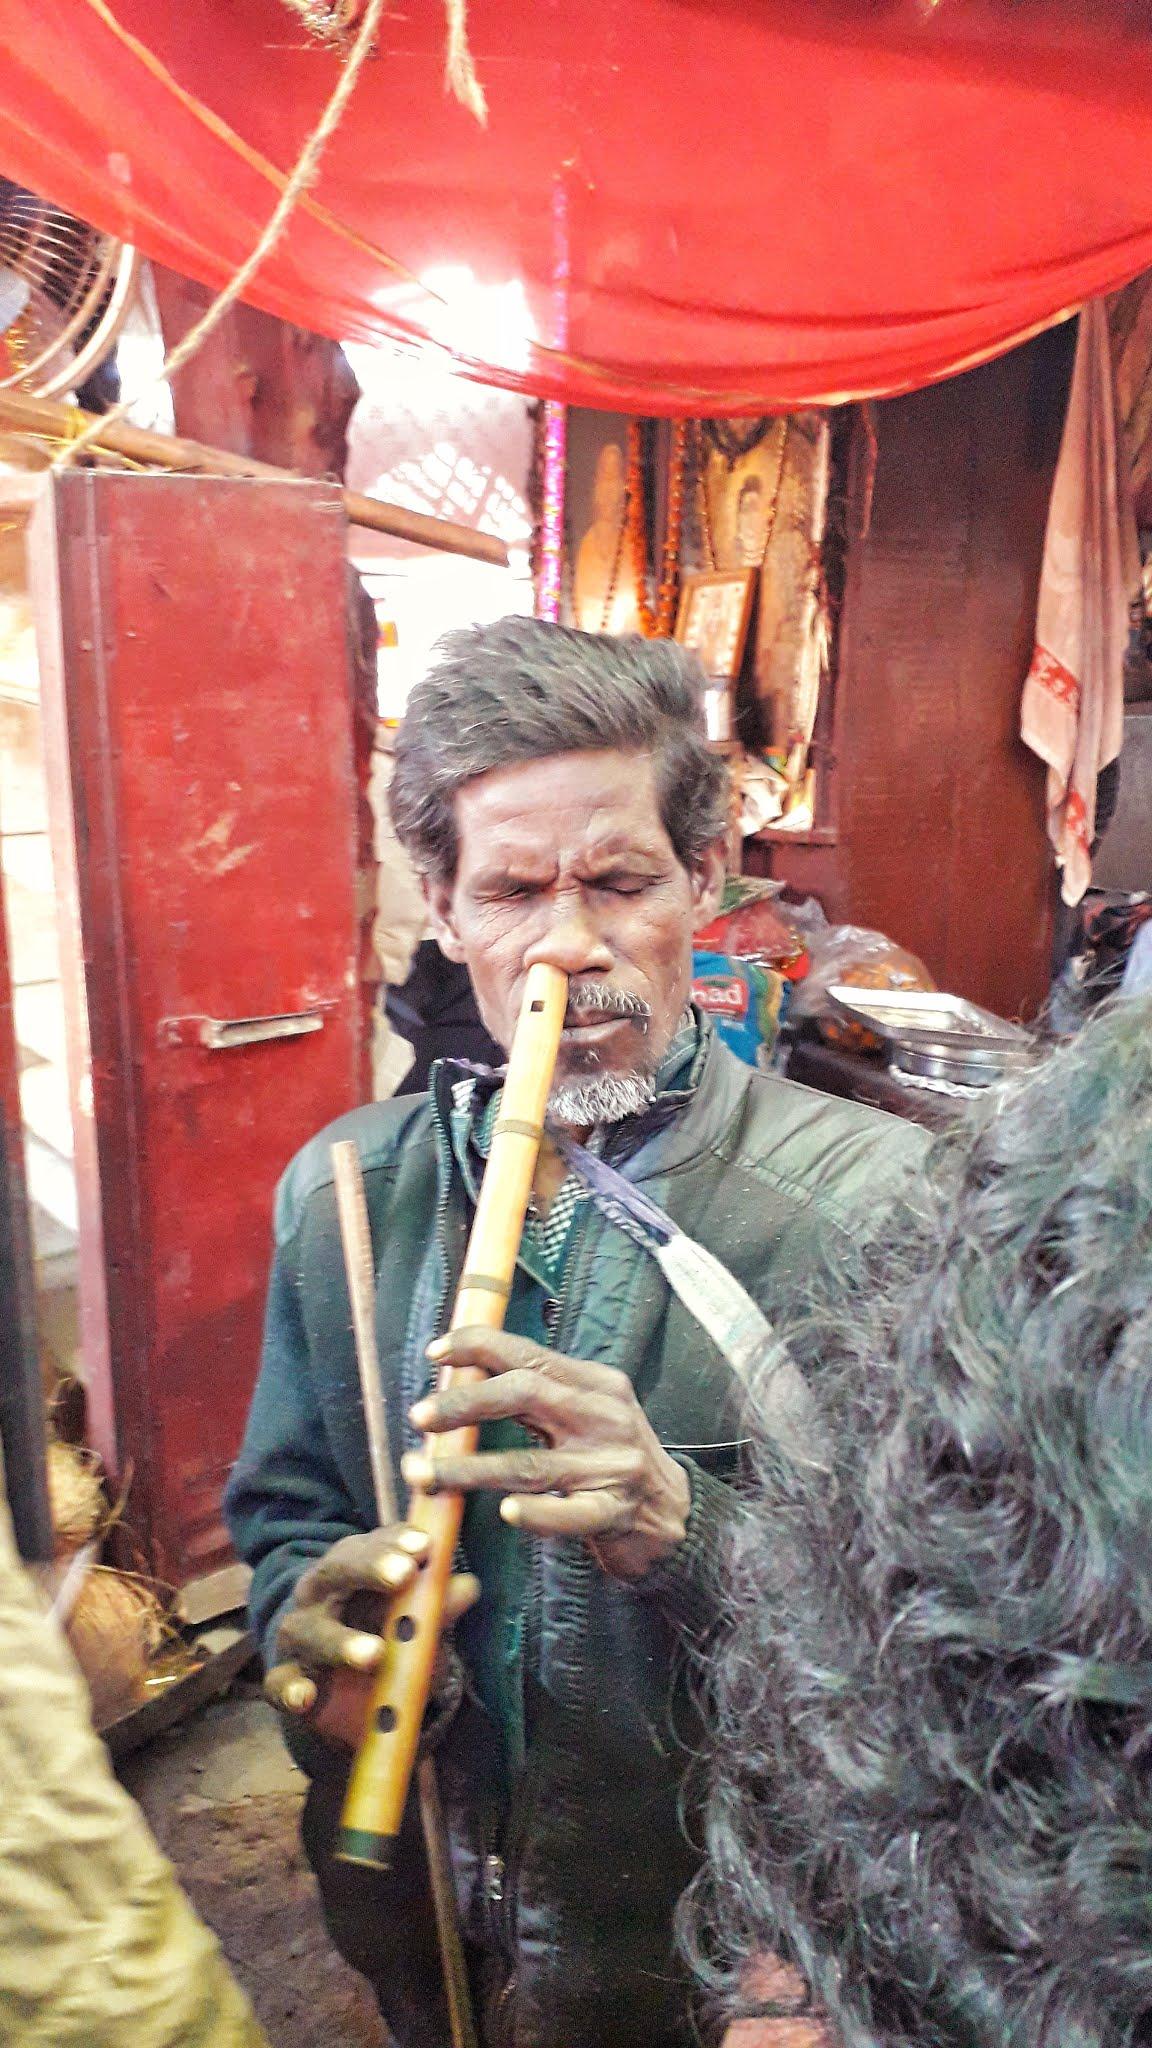 flute player in india, Shakumbhari Devi, Behat, Jasmour, Saharanpur